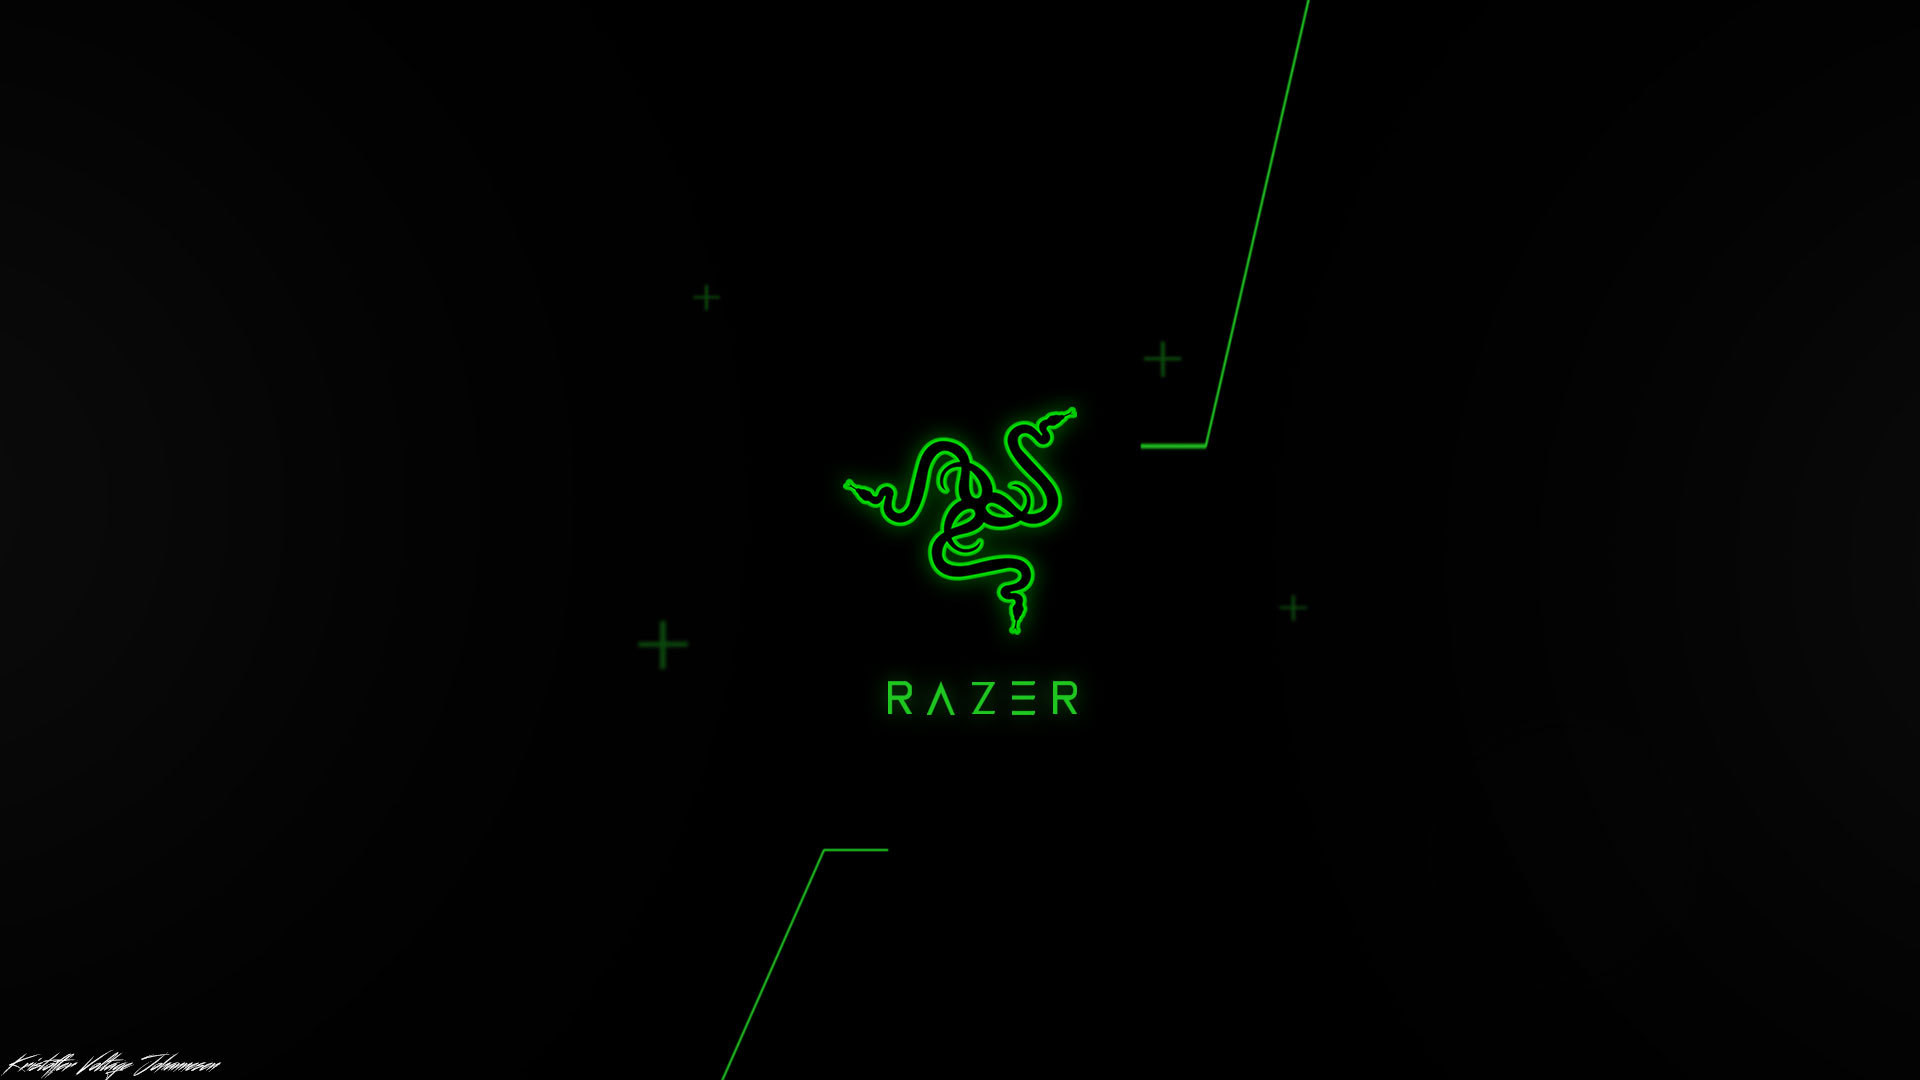 Обои На Рабочий Стол Razer